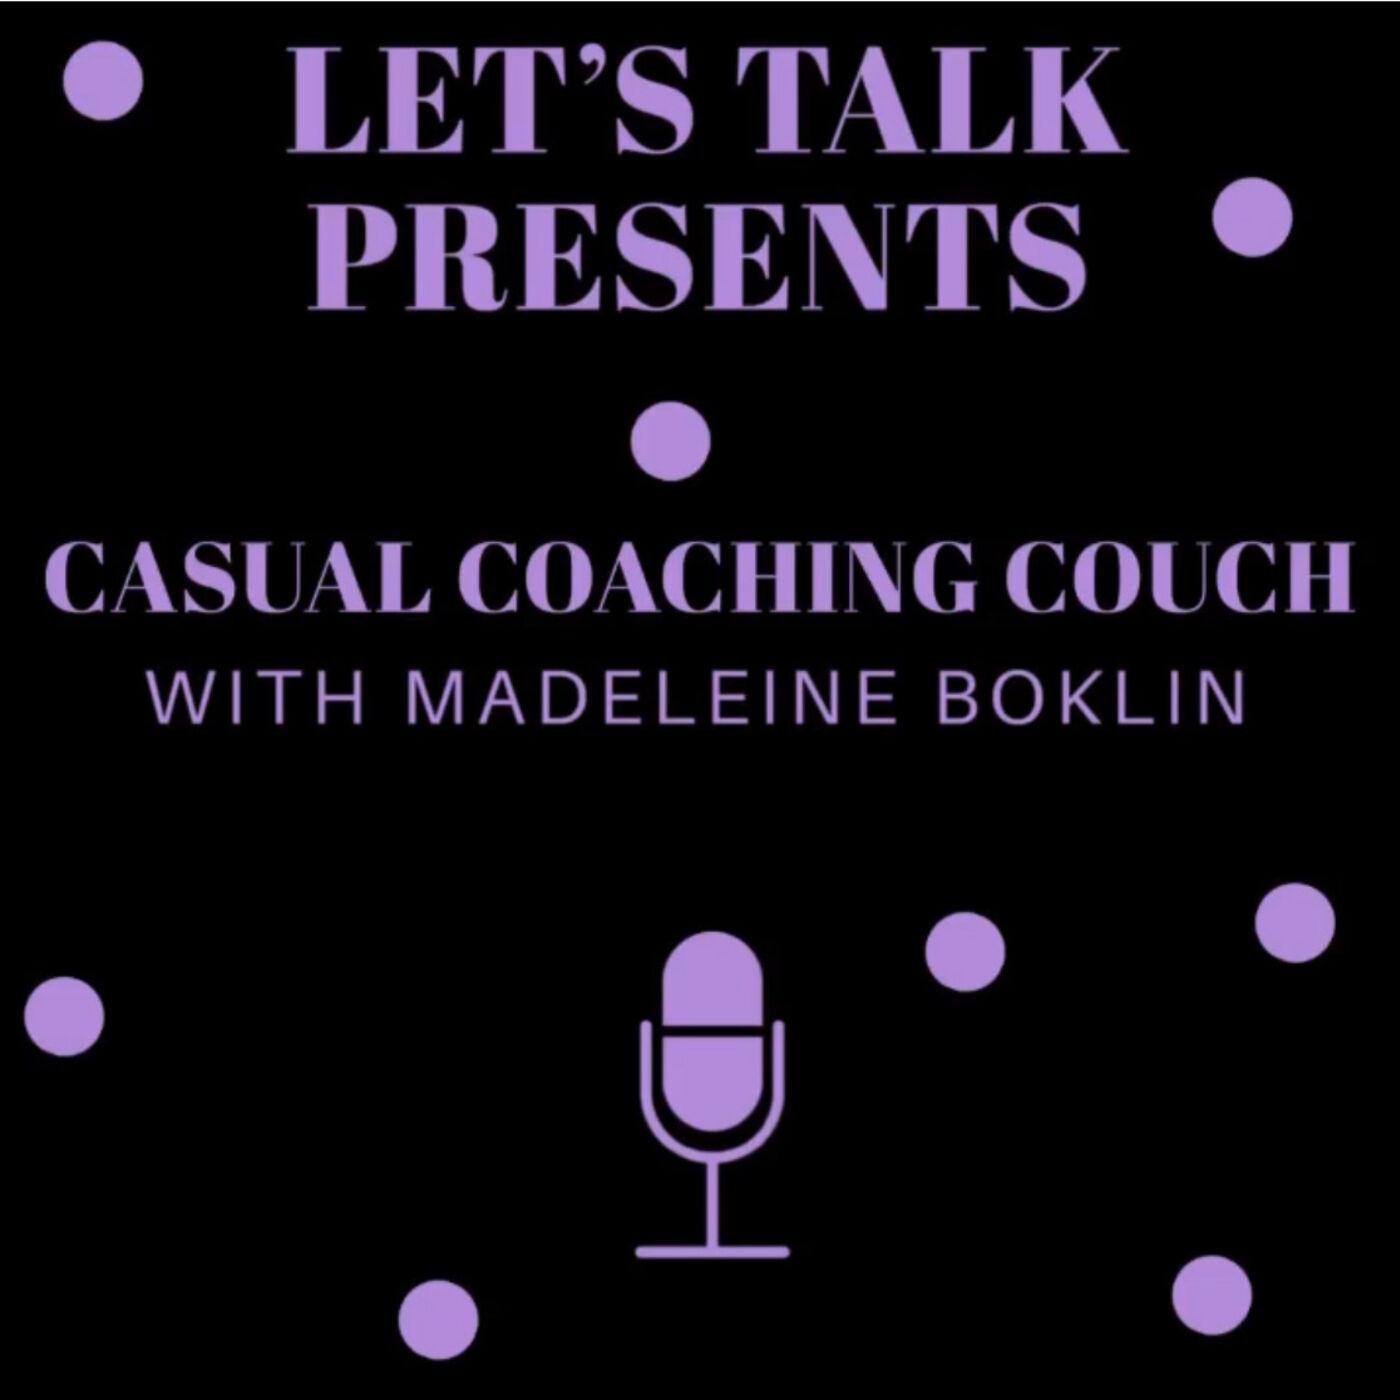 Casual Coaching Coach with Madeleine Boklin